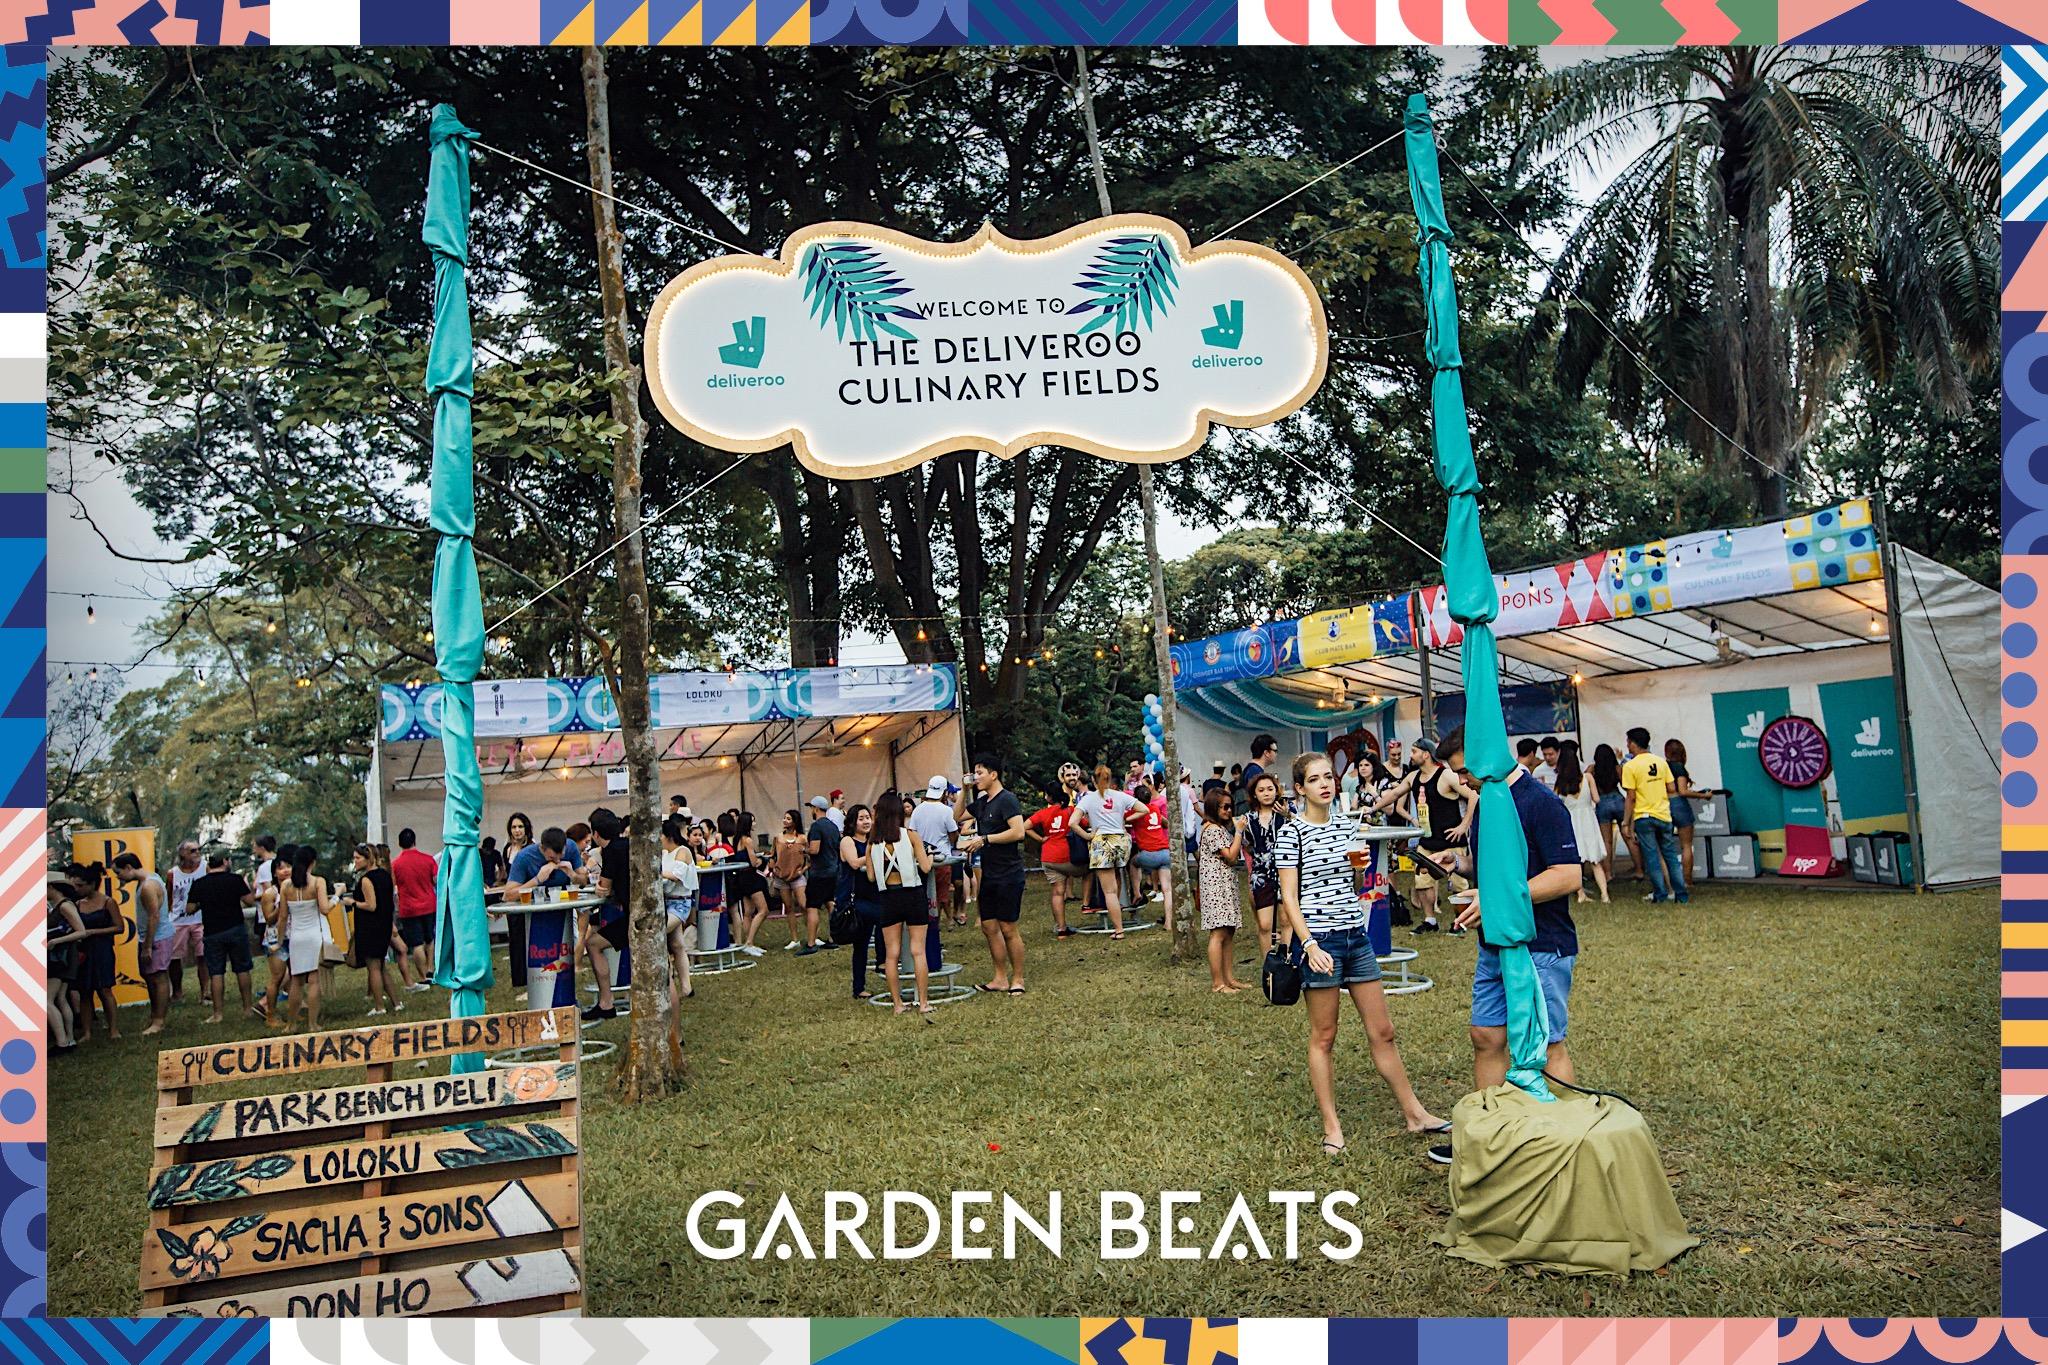 18032017_GardenBeats_Colossal614_WatermarkedGB.jpg